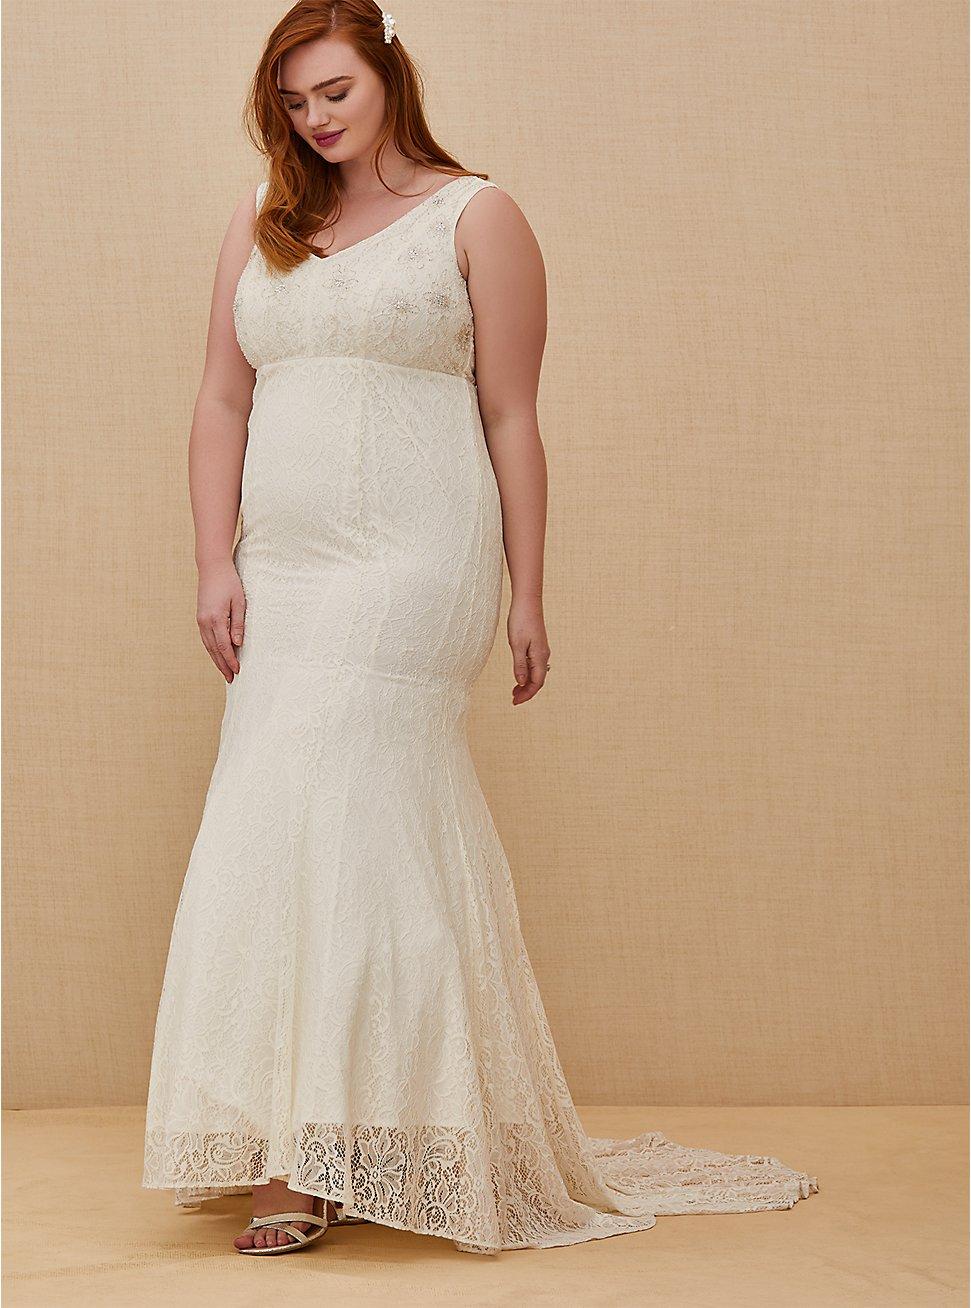 Ivory Lace Beaded Sleeveless Mermaid Wedding Dress, , fitModel1-hires